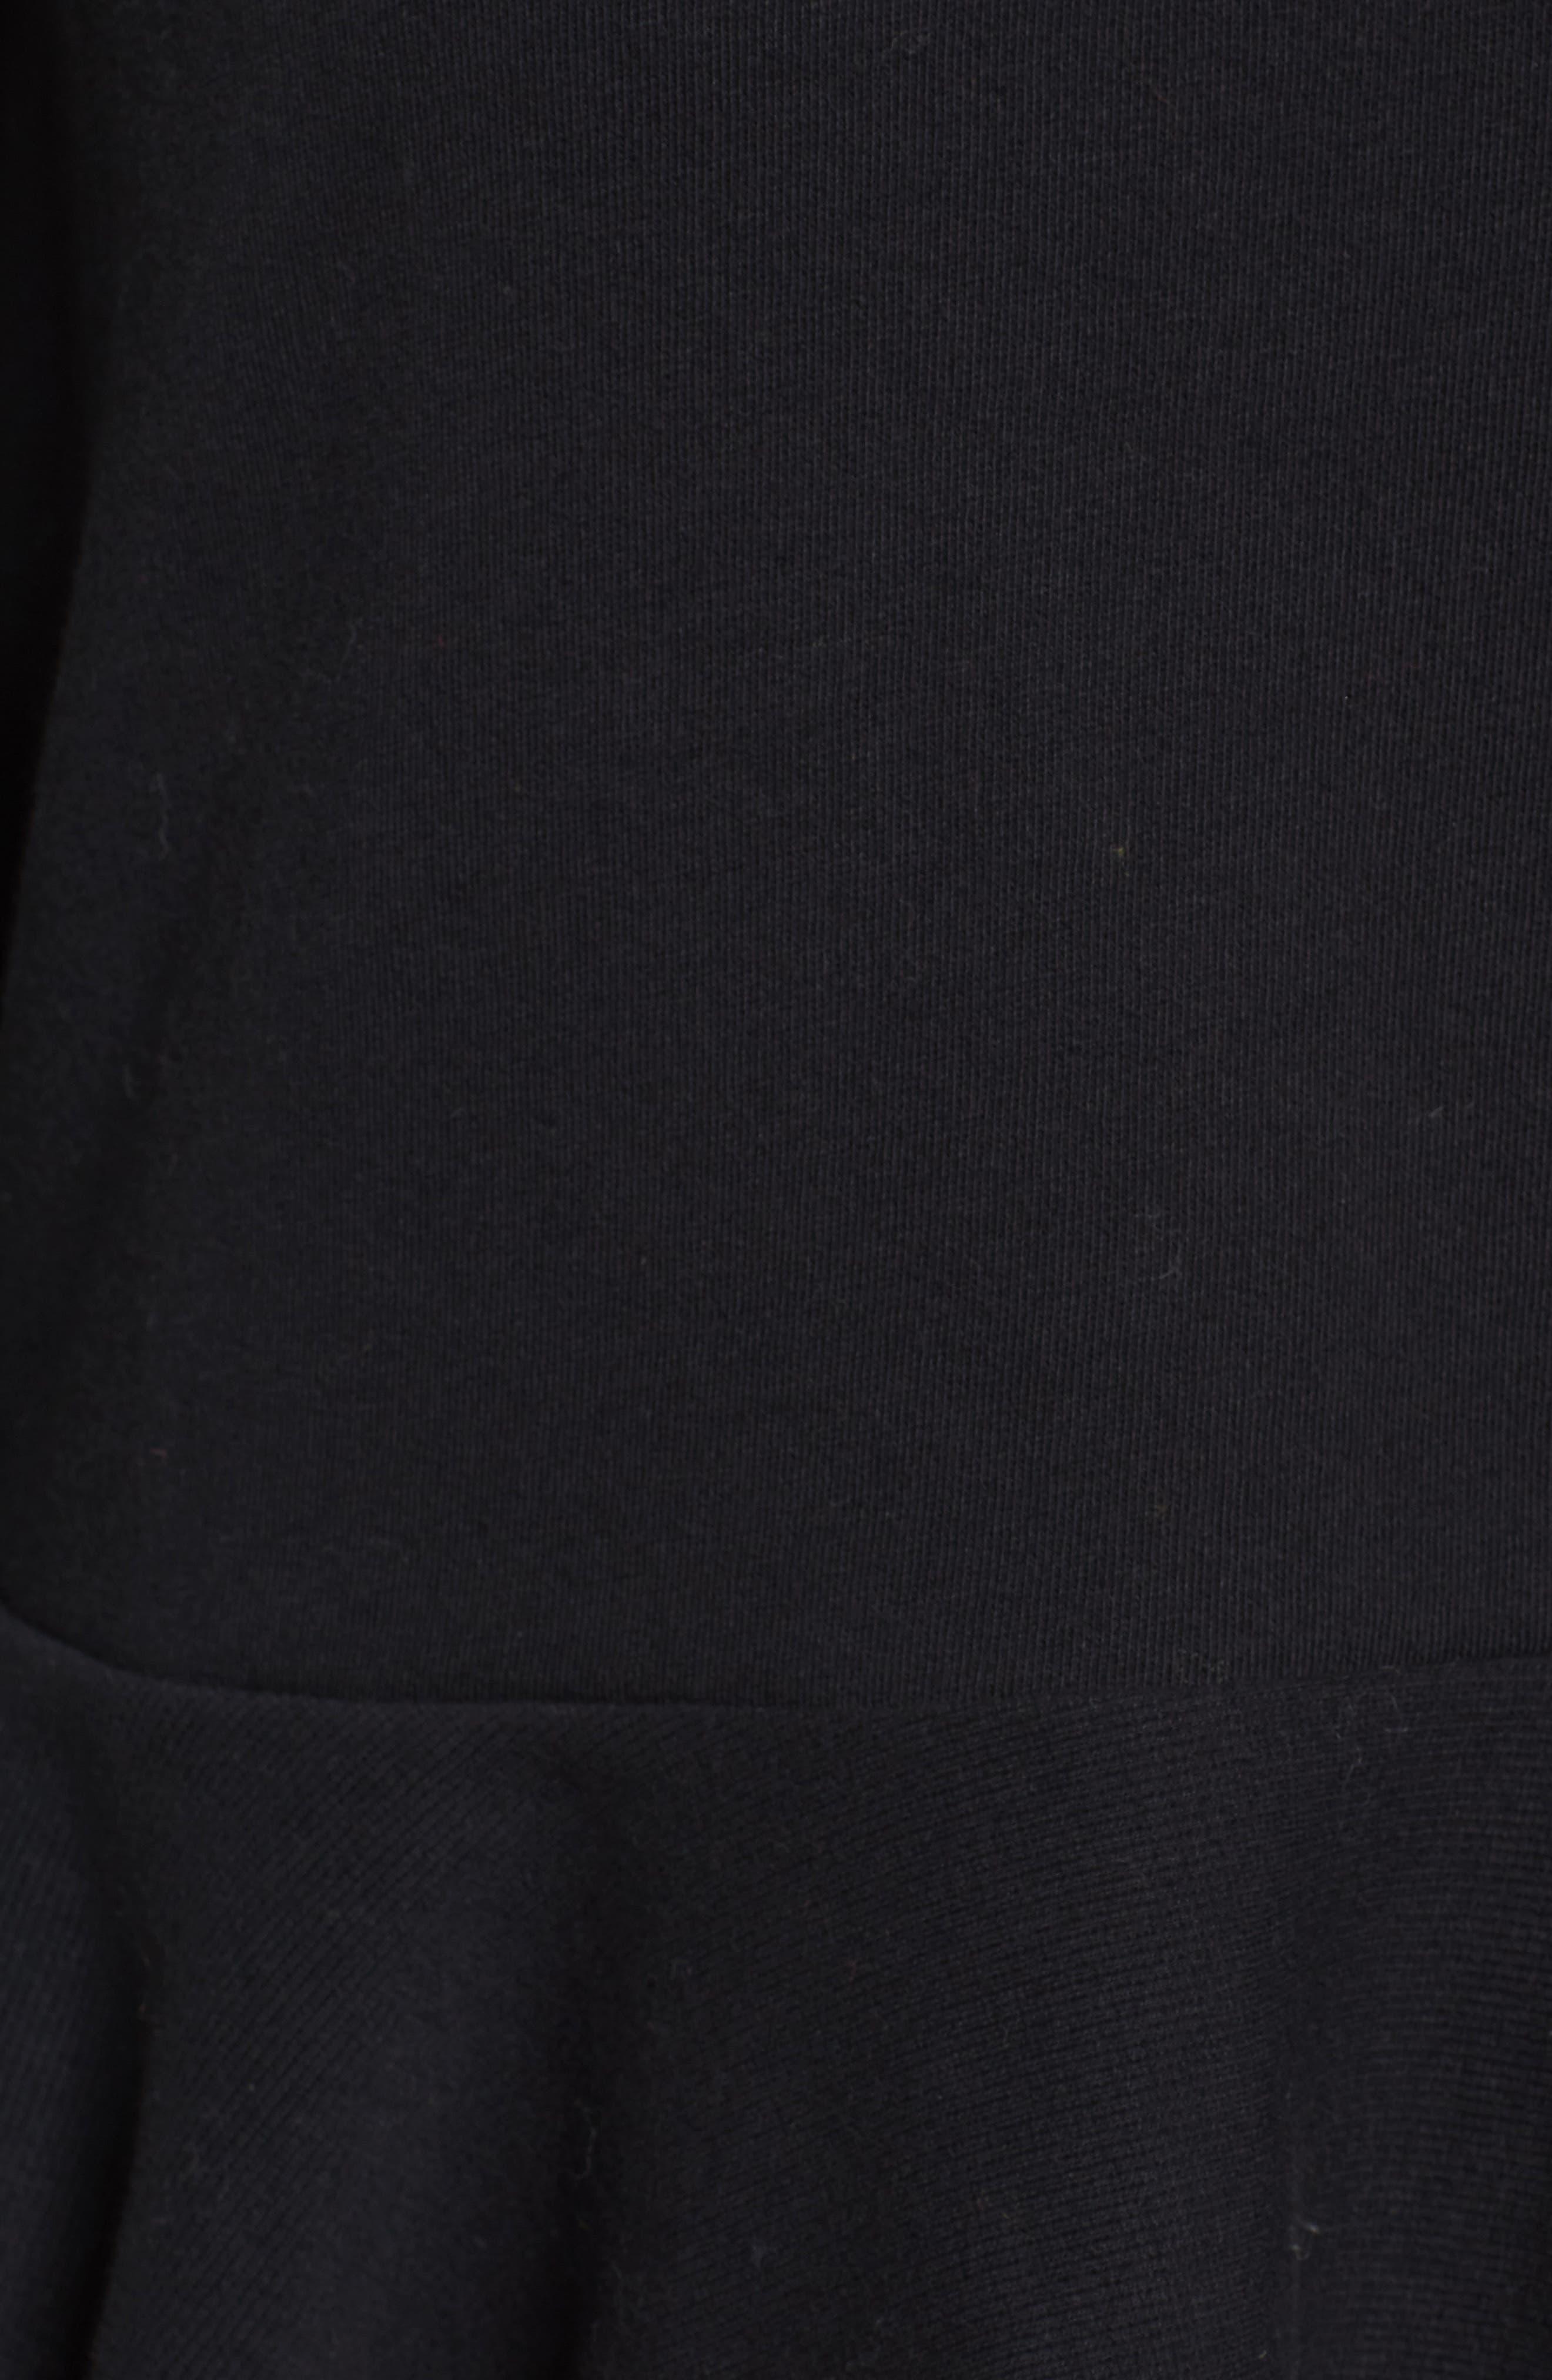 Ruffle Hem Bell Sleeve Top,                             Alternate thumbnail 5, color,                             001